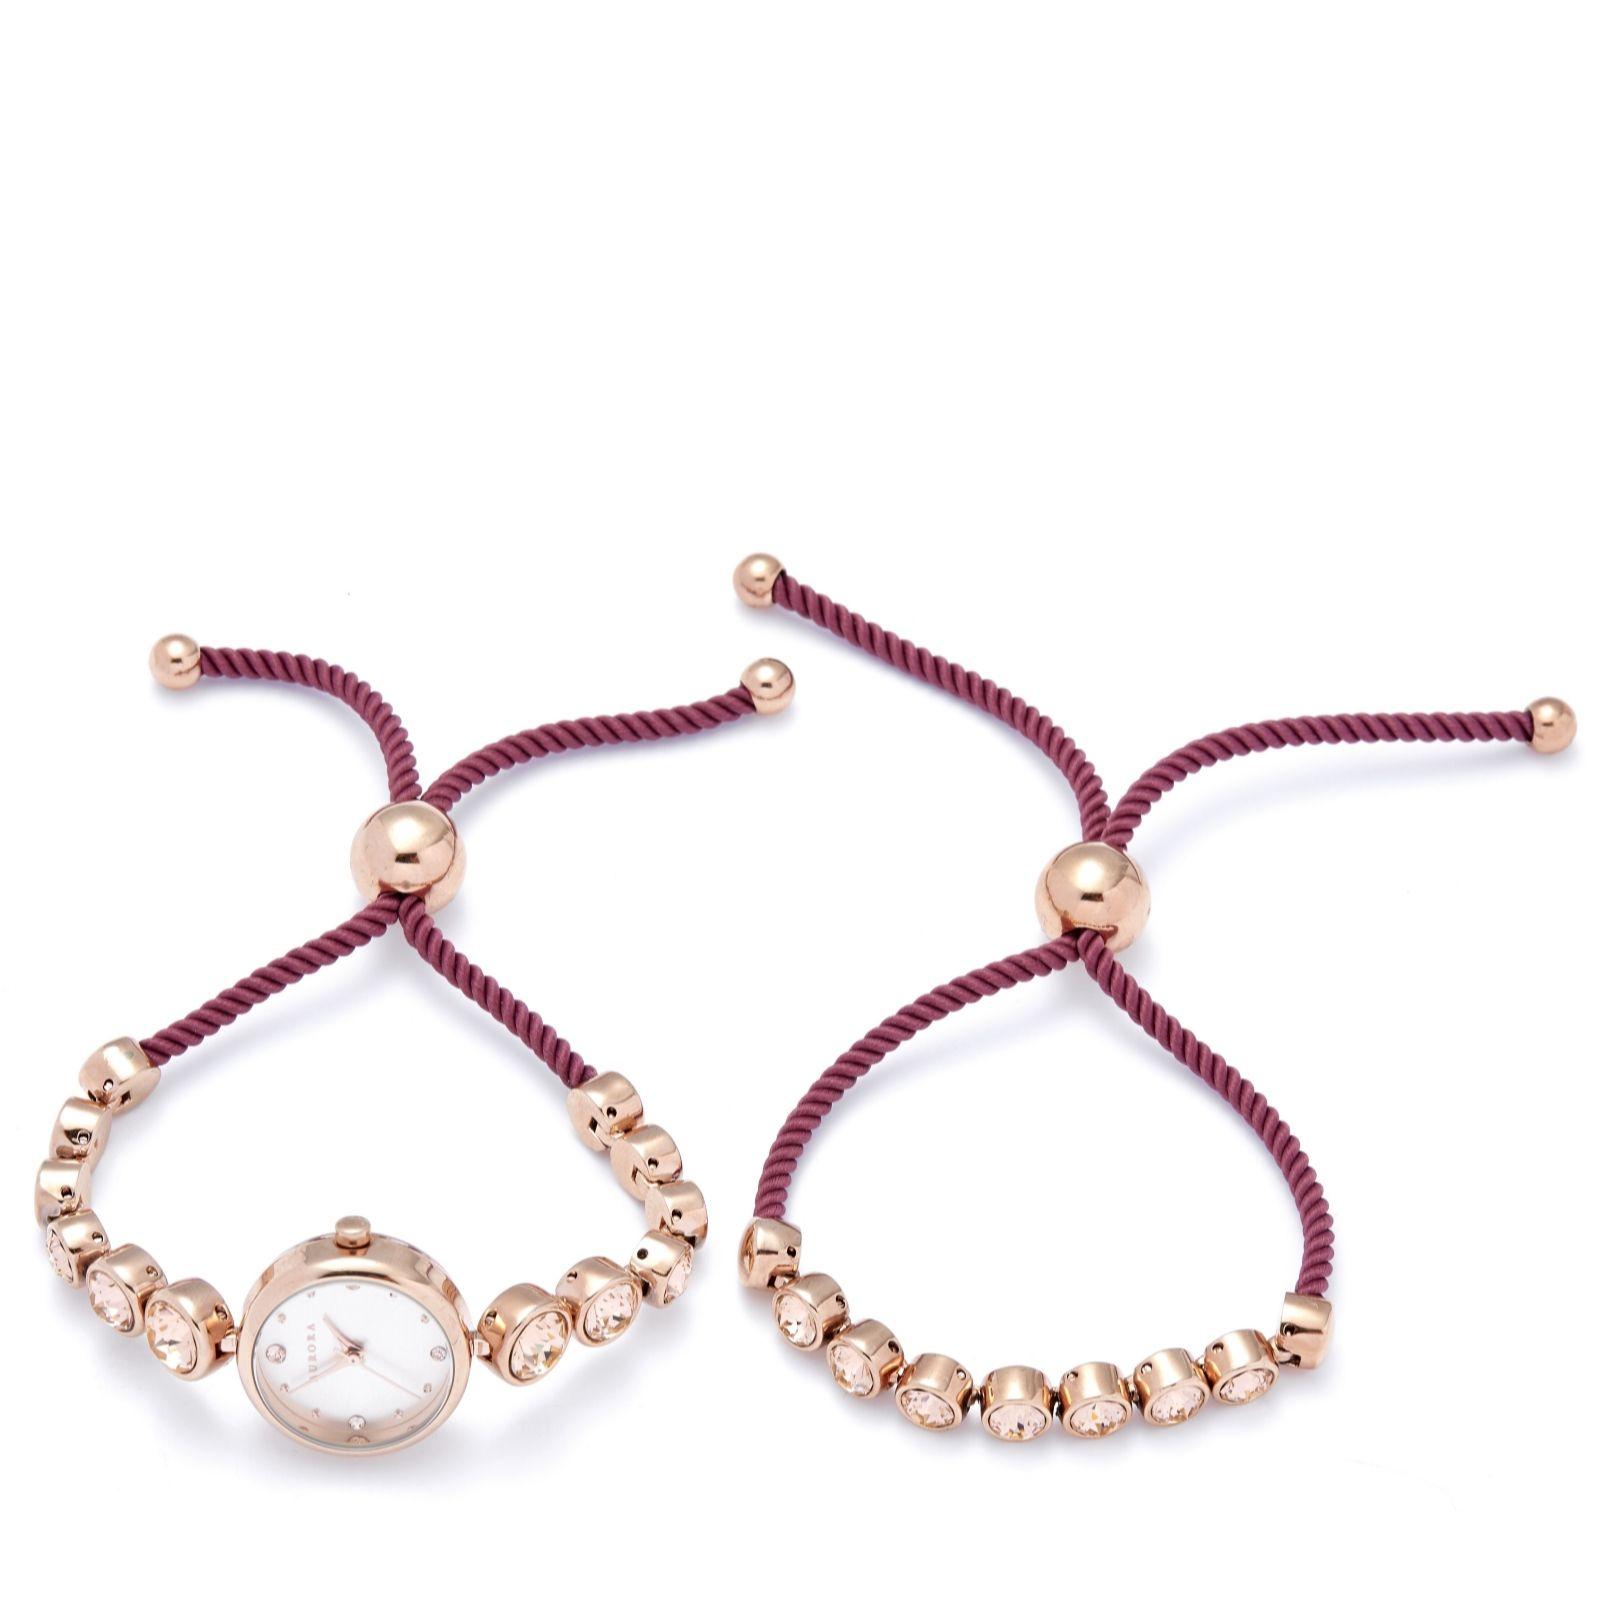 f287b02a1 Aurora Swarovski Crystal Friendship Bracelet & Watch Set - QVC UK